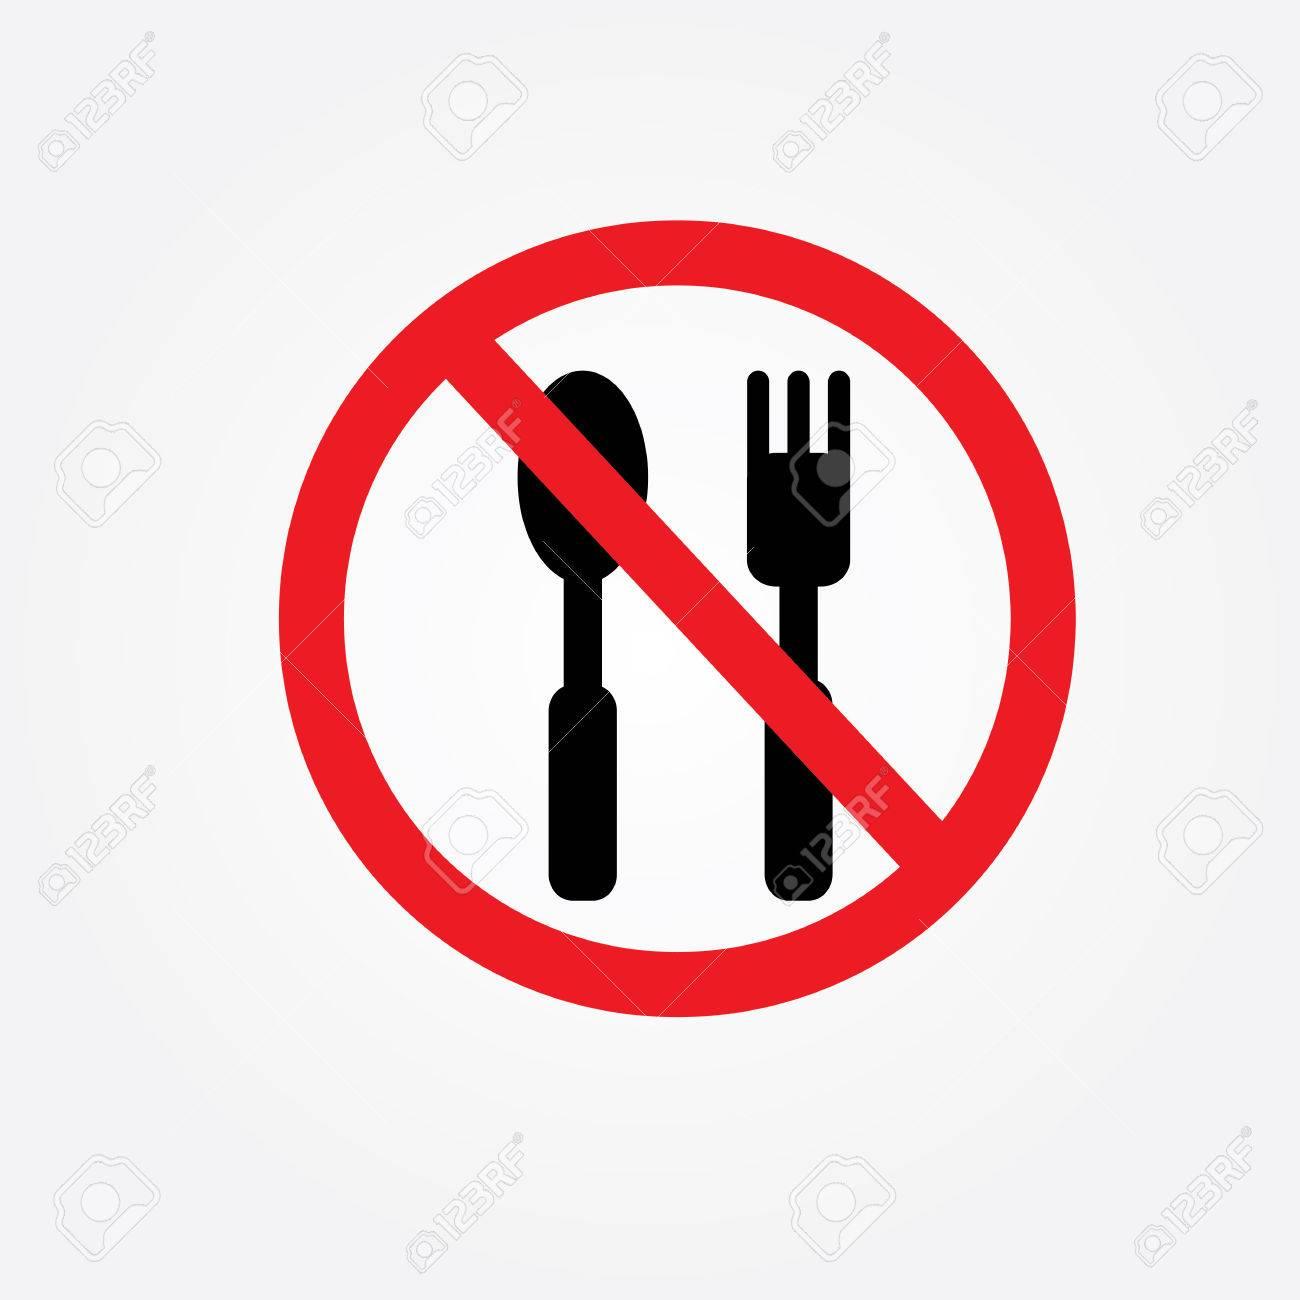 no eating vector sign no food or drink allowed vector royalty free rh 123rf com no food sign clipart no food symbol clipart